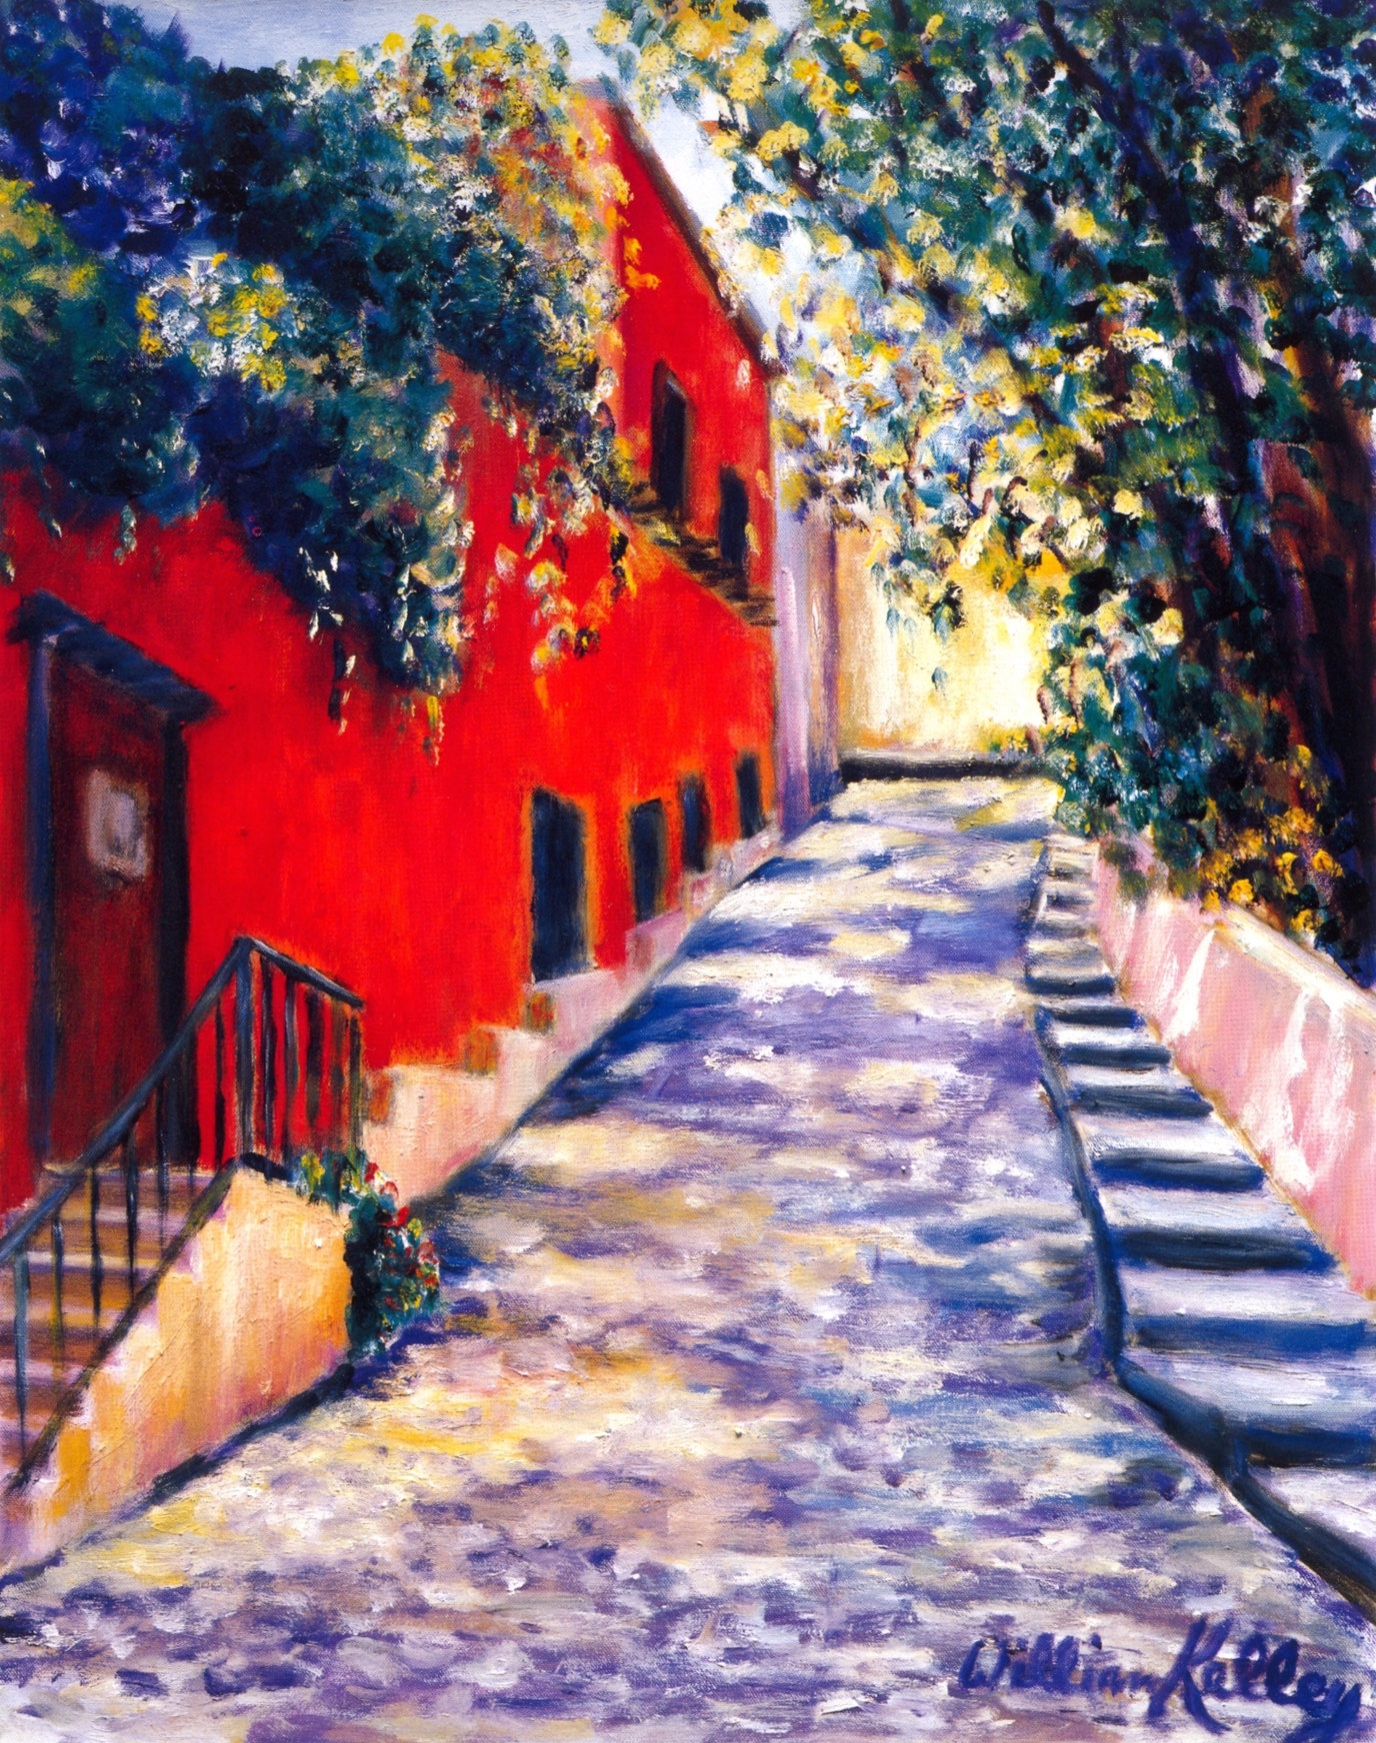 Casa Liza San Miguel d'Allende   Oil on canvas, 20'' x 24'', 2003